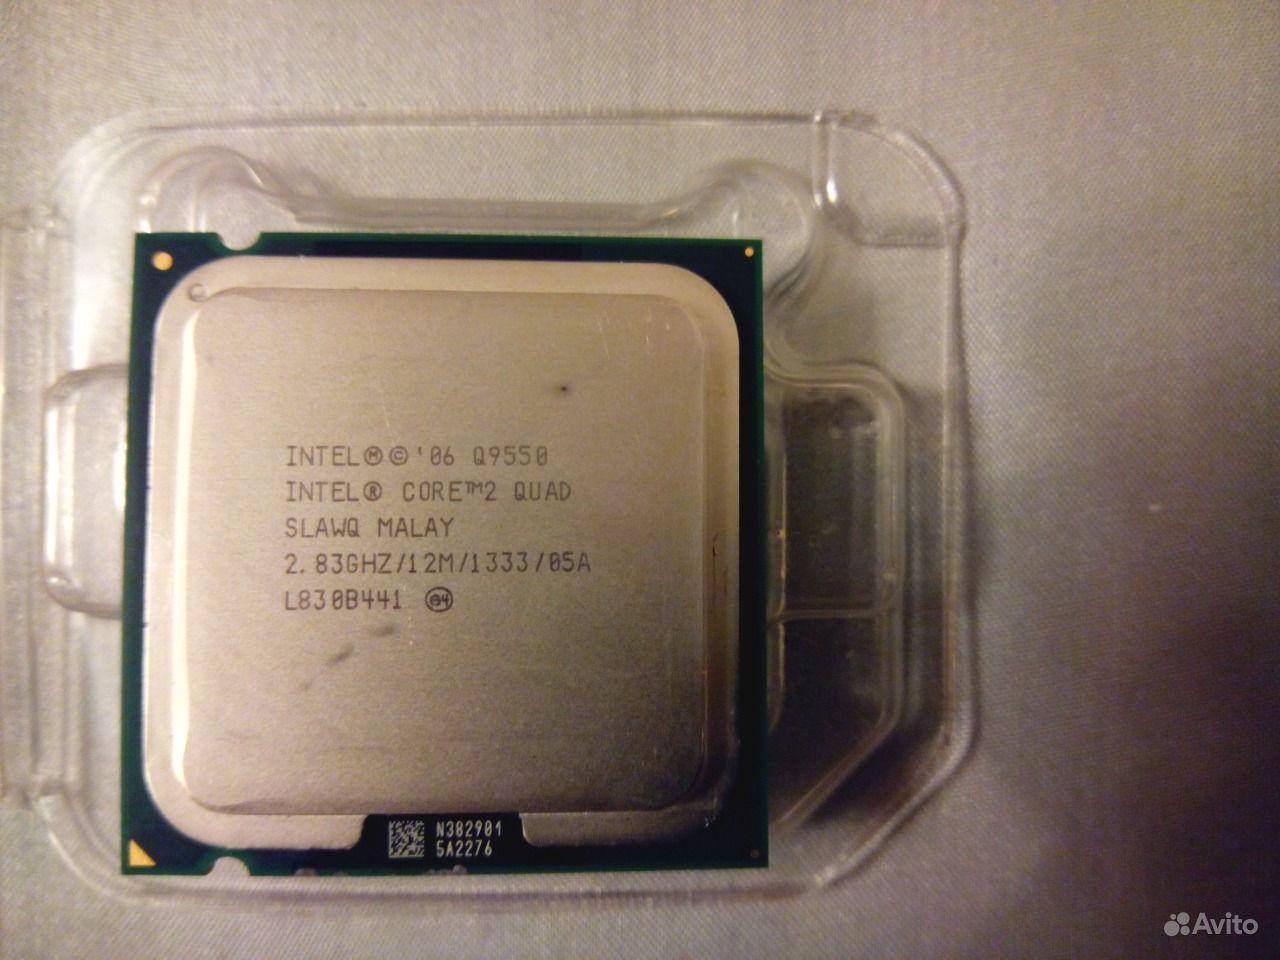 Lga 775 Intel Core Quad Q9550 2 Q 9550